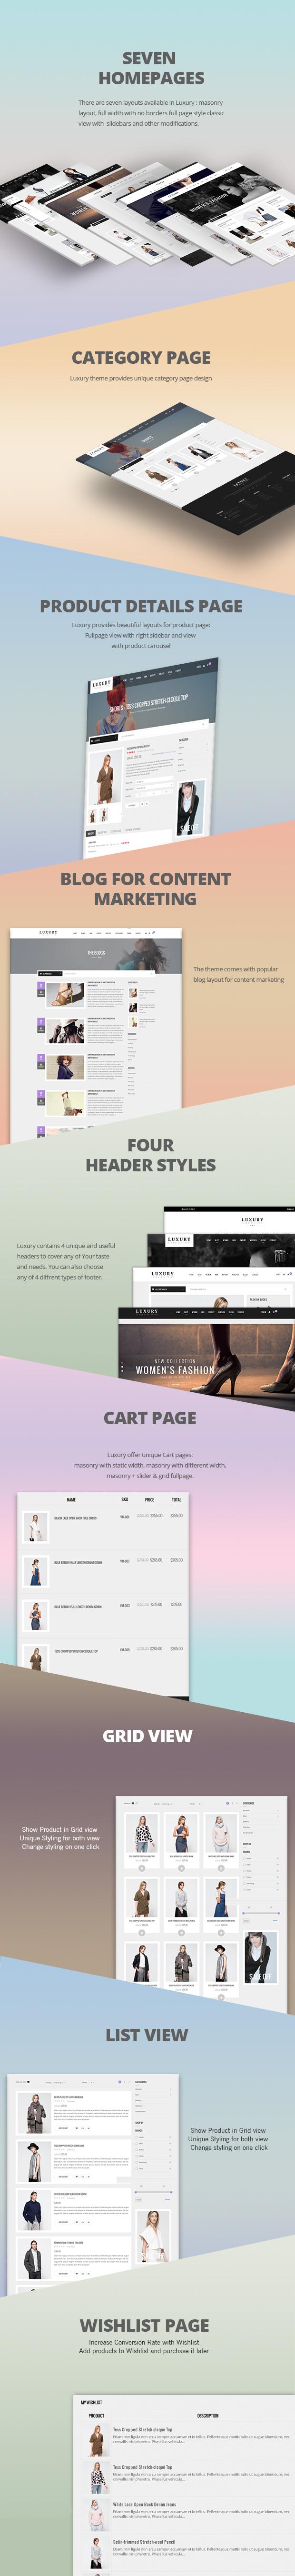 Joomla template for online store